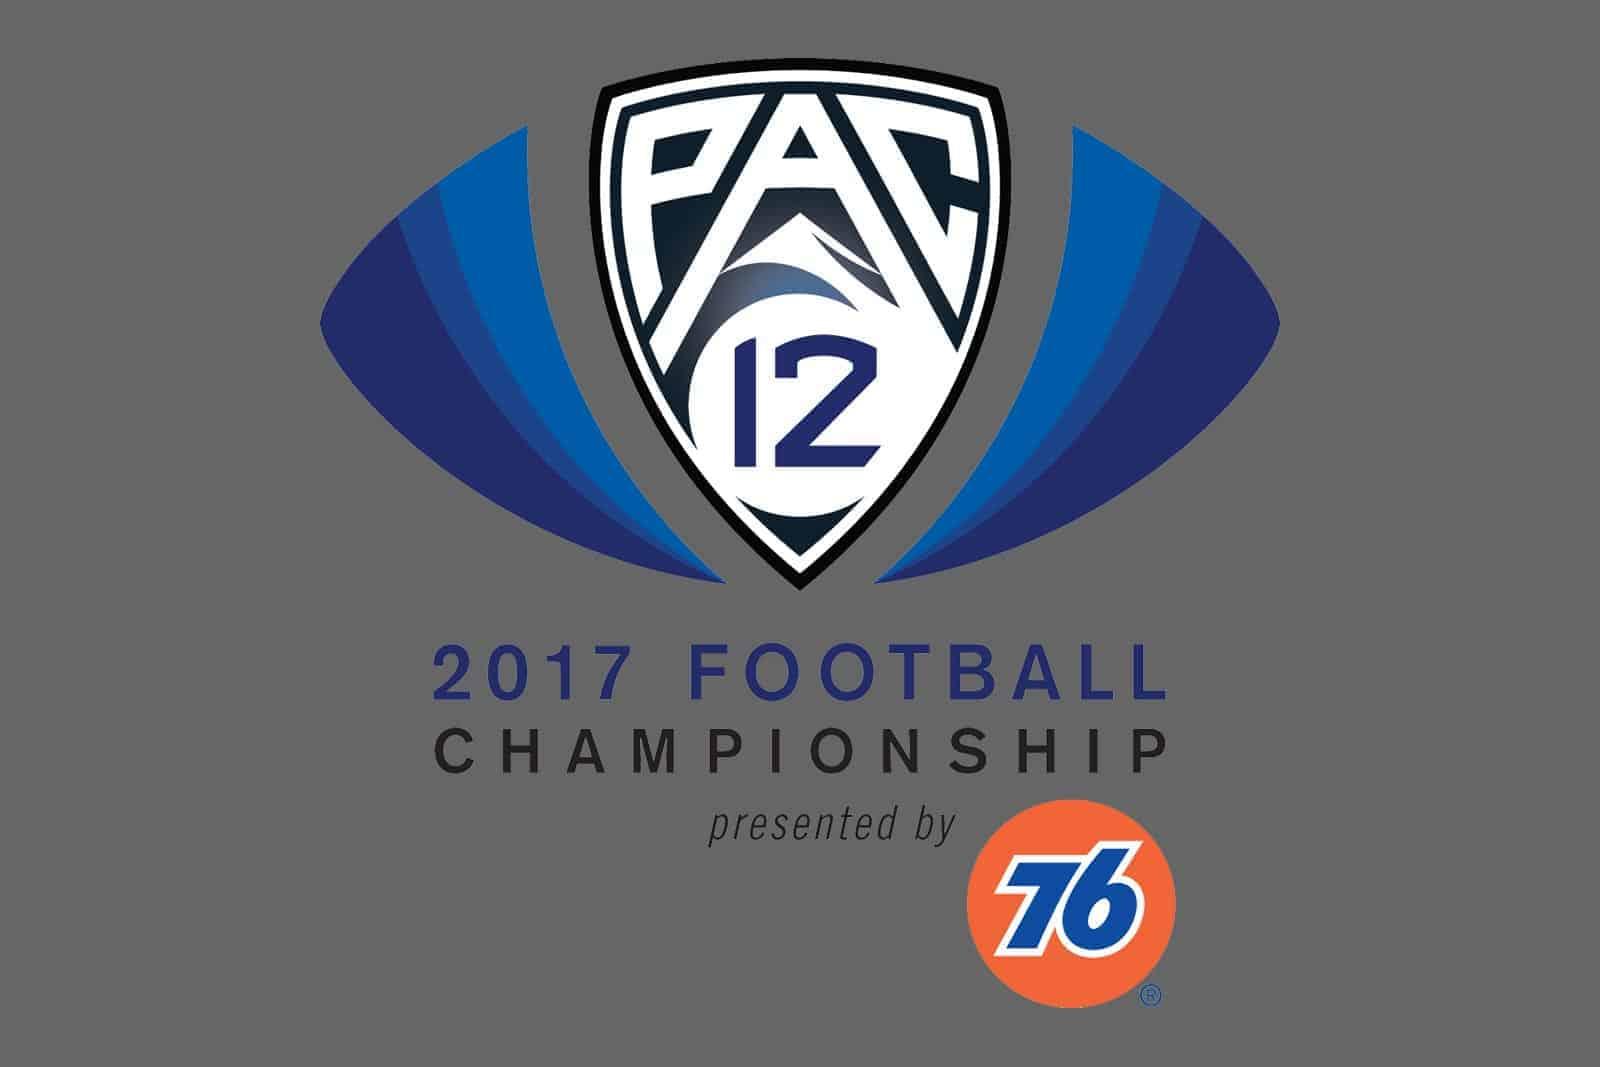 Pac-12 Championship Game